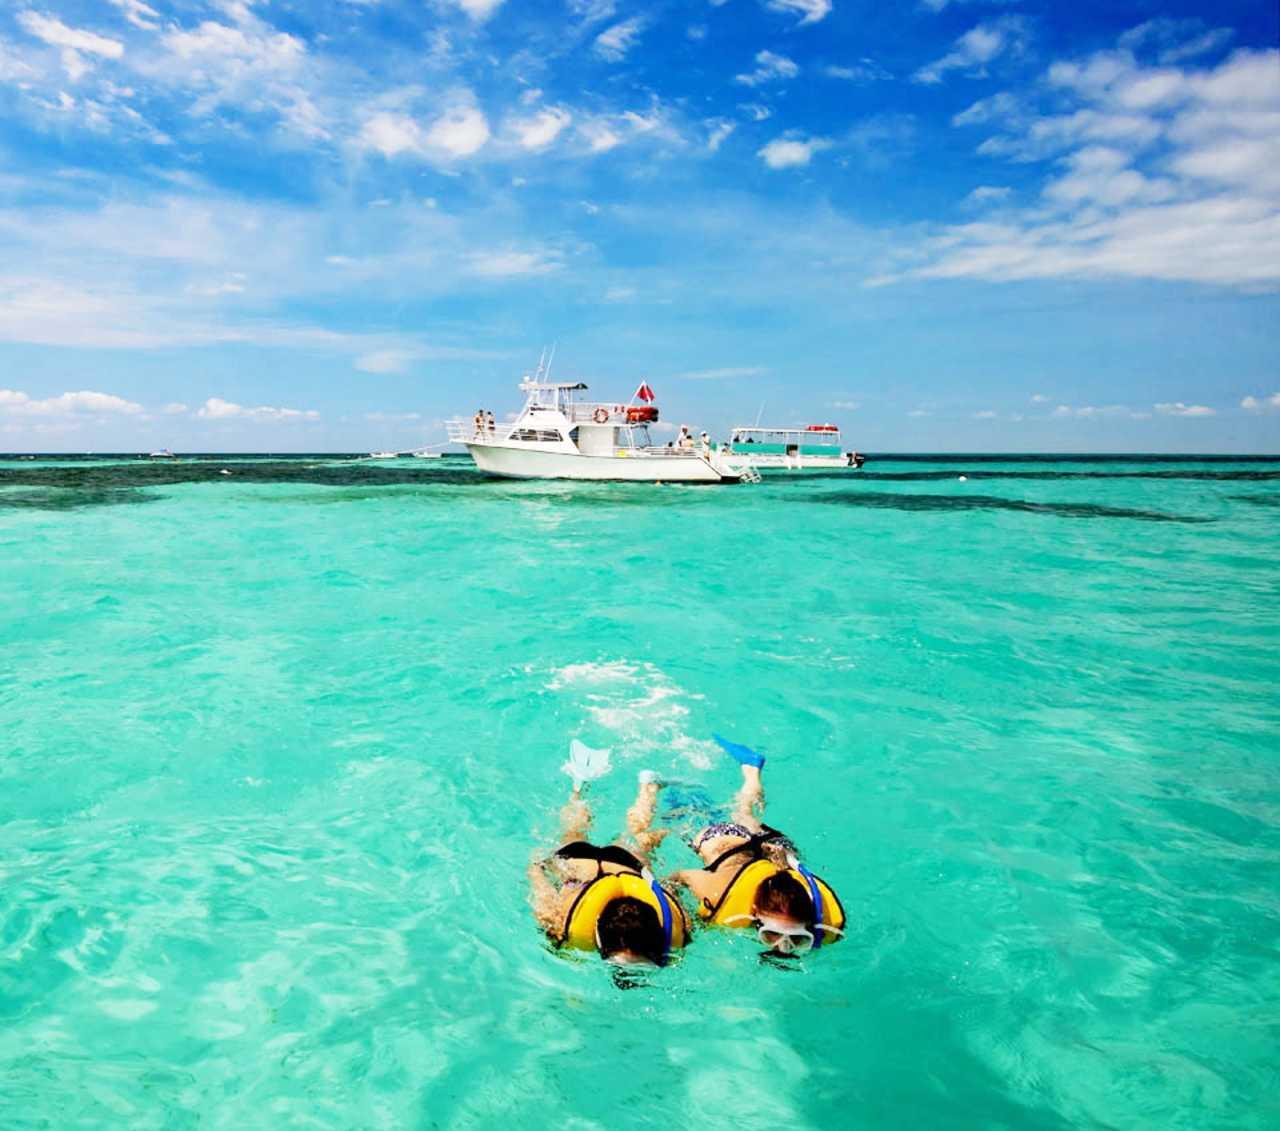 Strandurlaub Special: Florida-Autorundreise ab Miami! | CANUSA